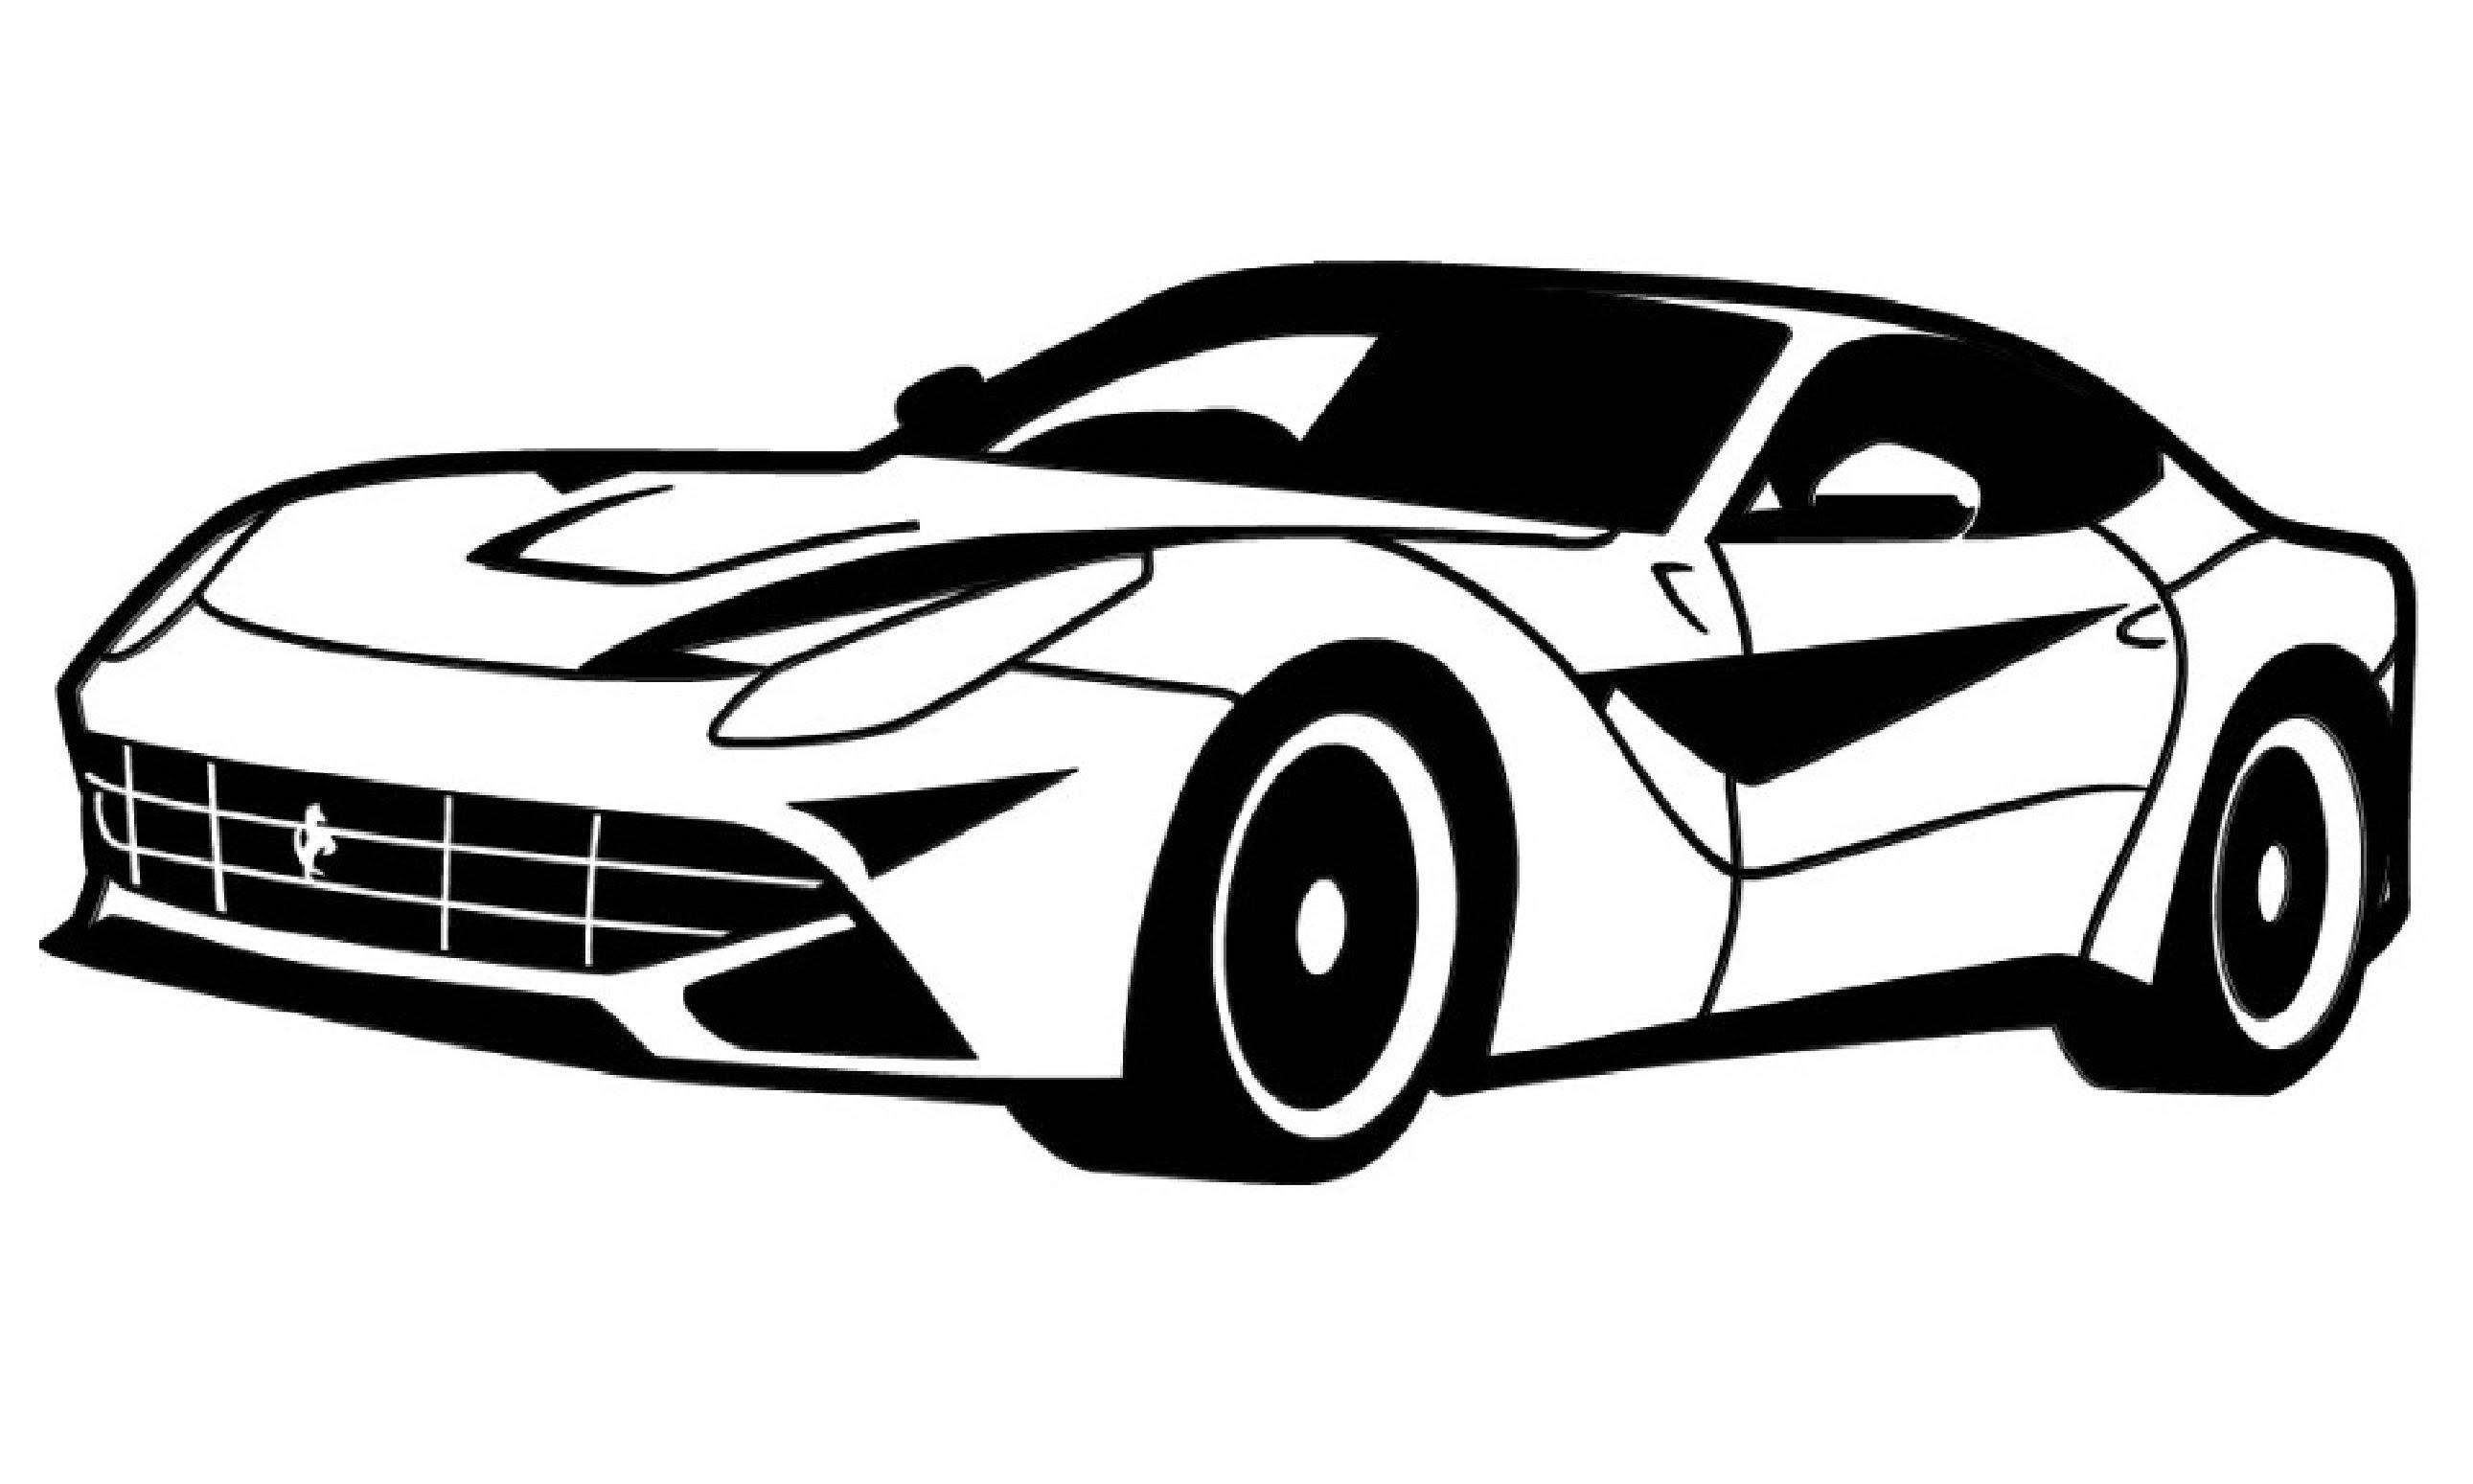 2581x1549 Drawn Ferrari Black And White